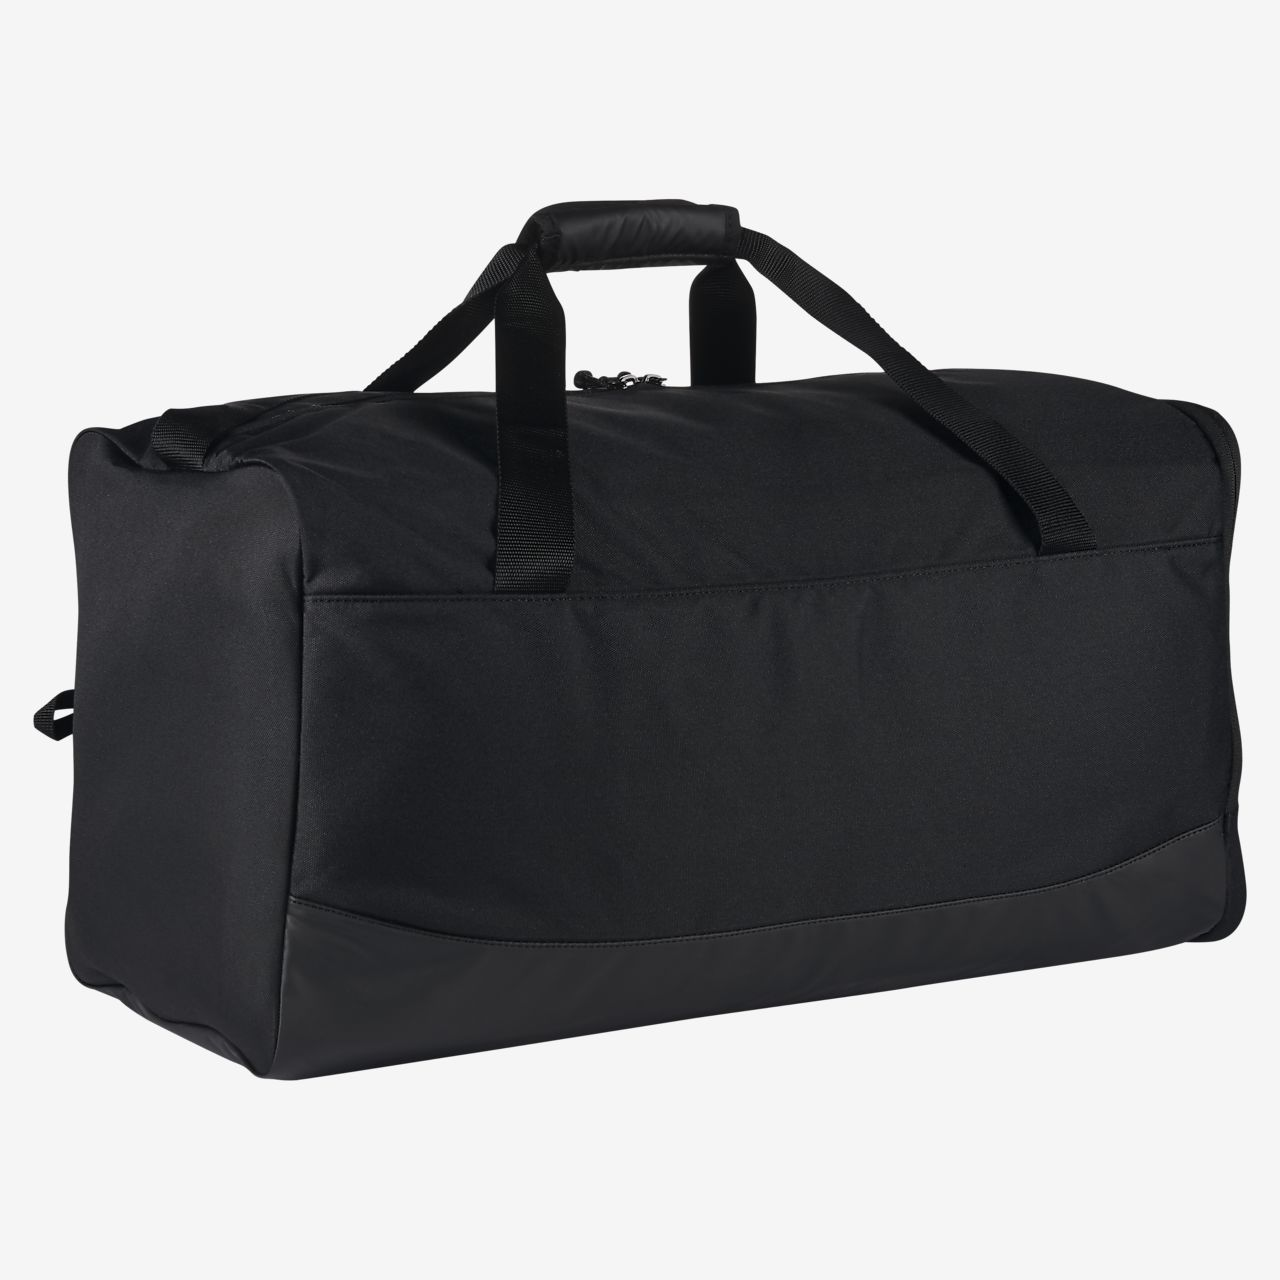 51dff33f10 Low Resolution Jordan Trainer Duffel Bag Jordan Trainer Duffel Bag